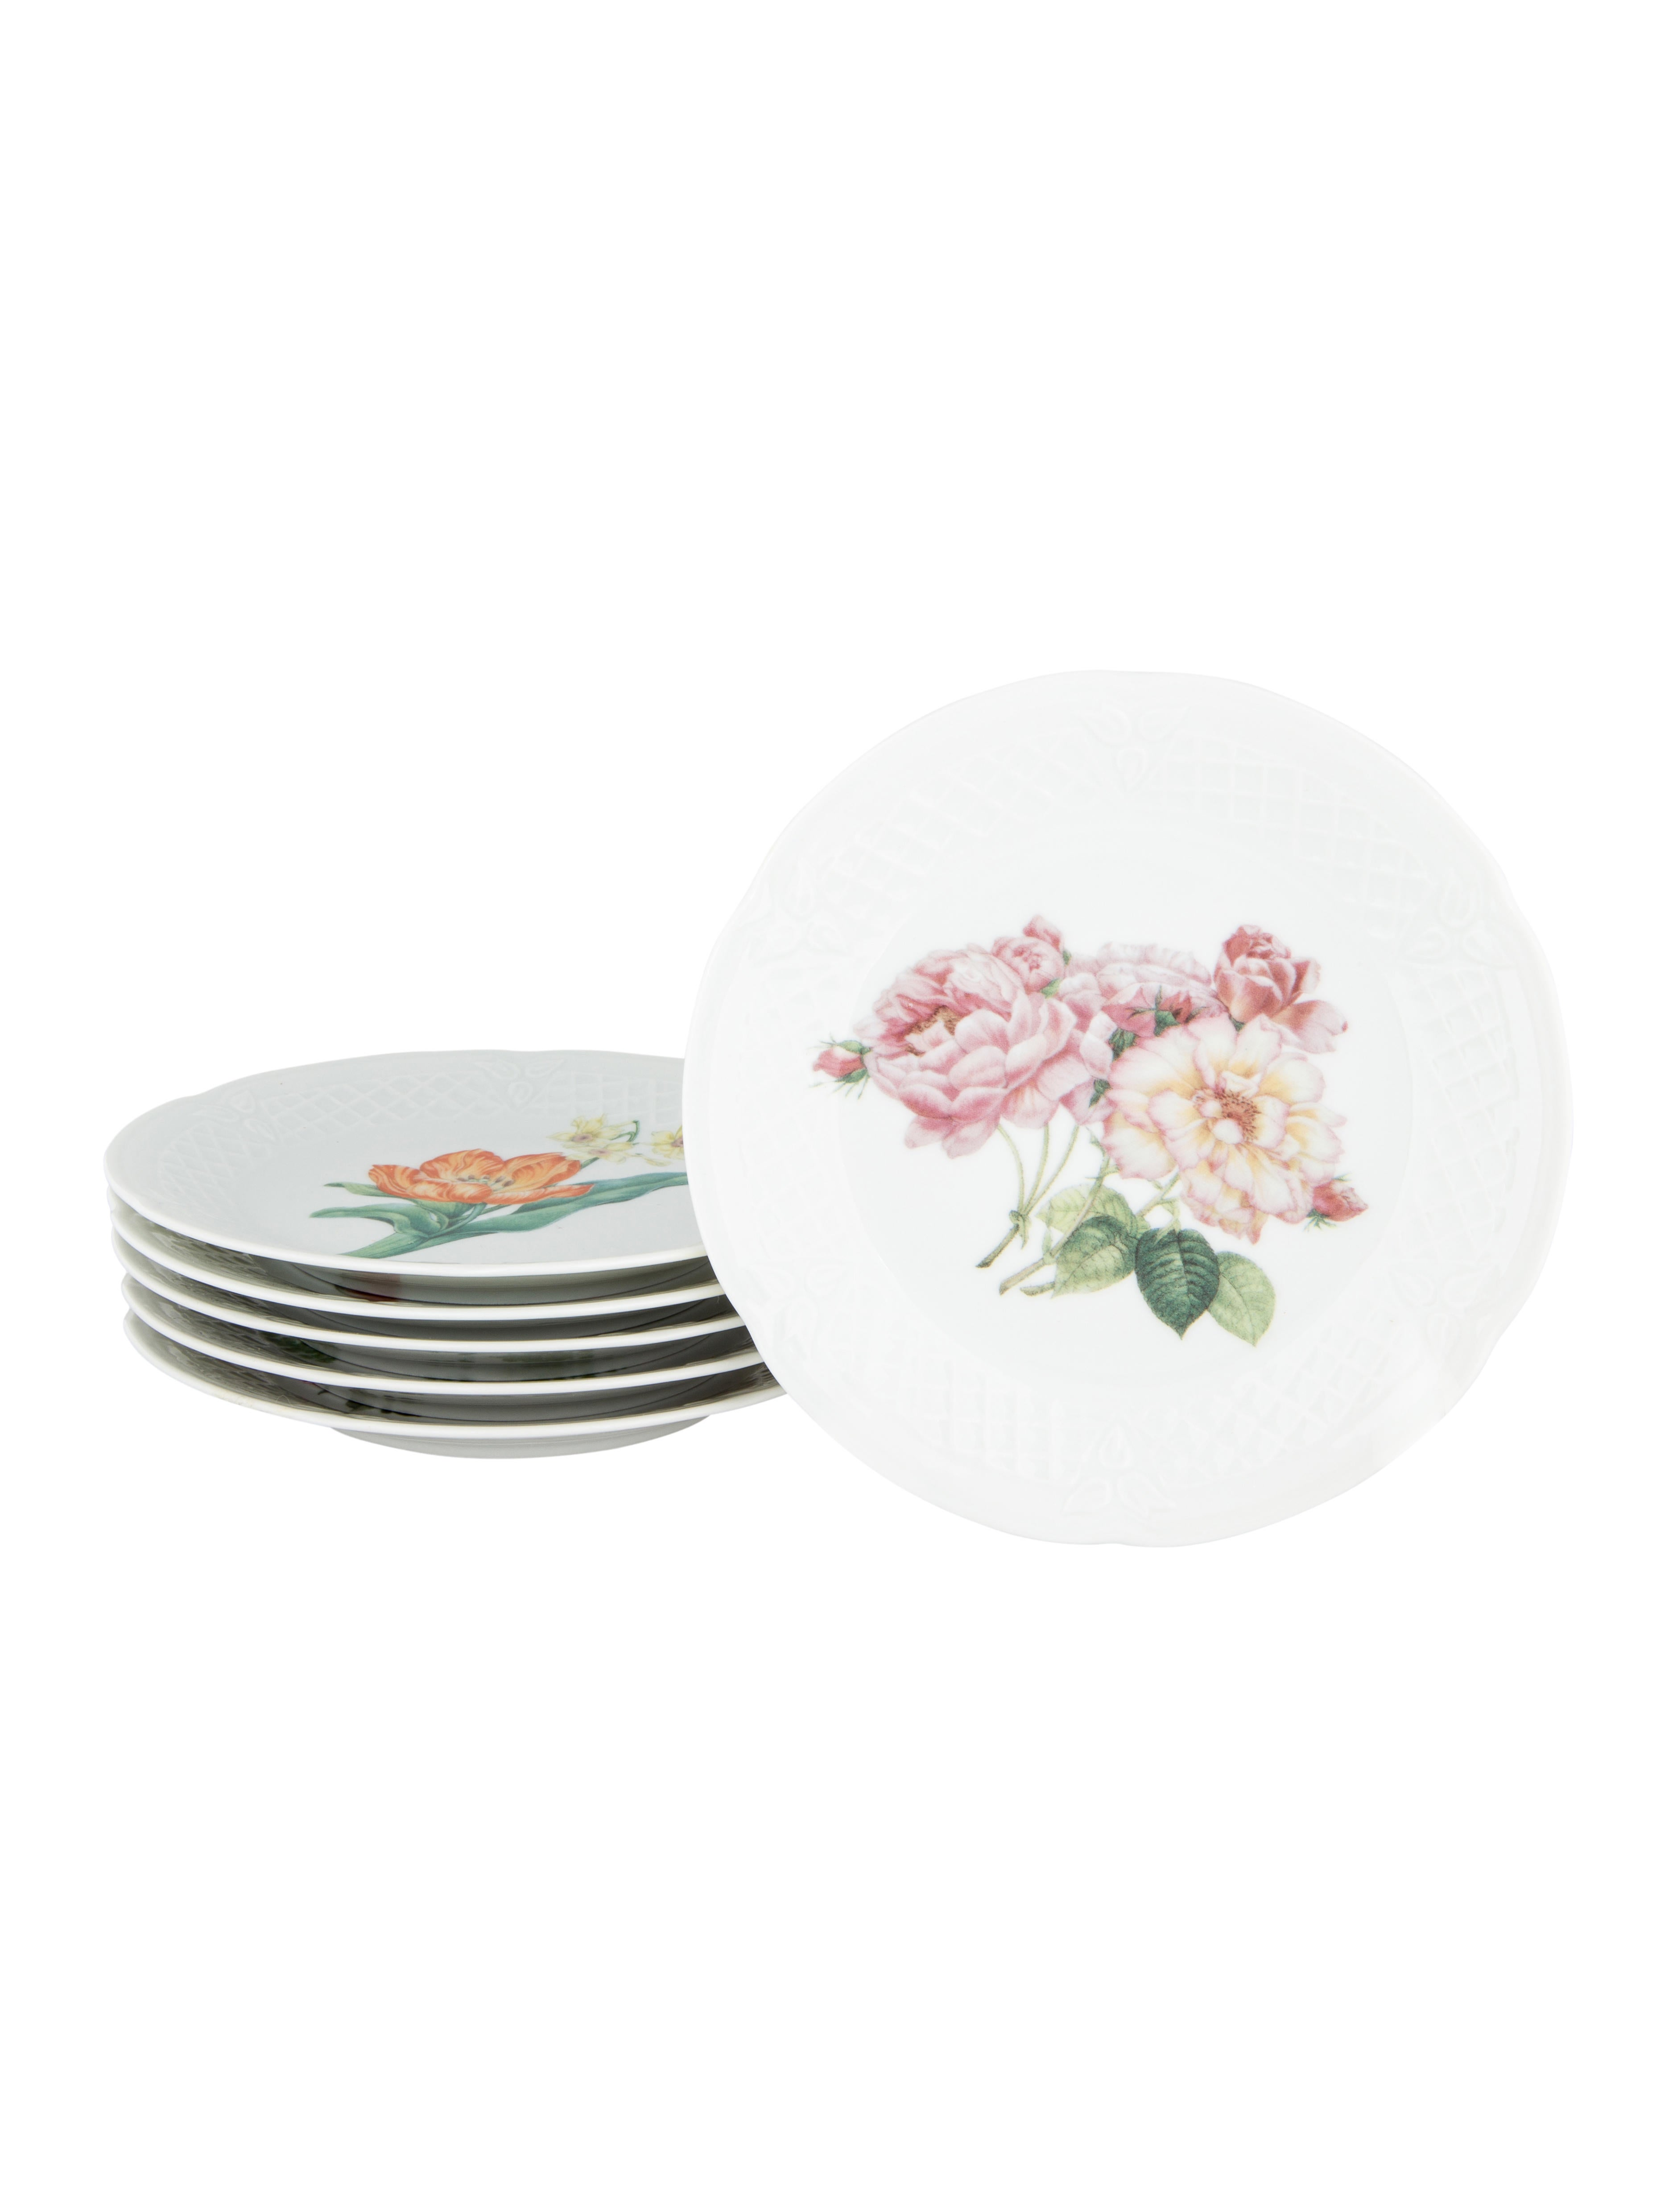 philippe deshoulieres spring bouquet canap plates